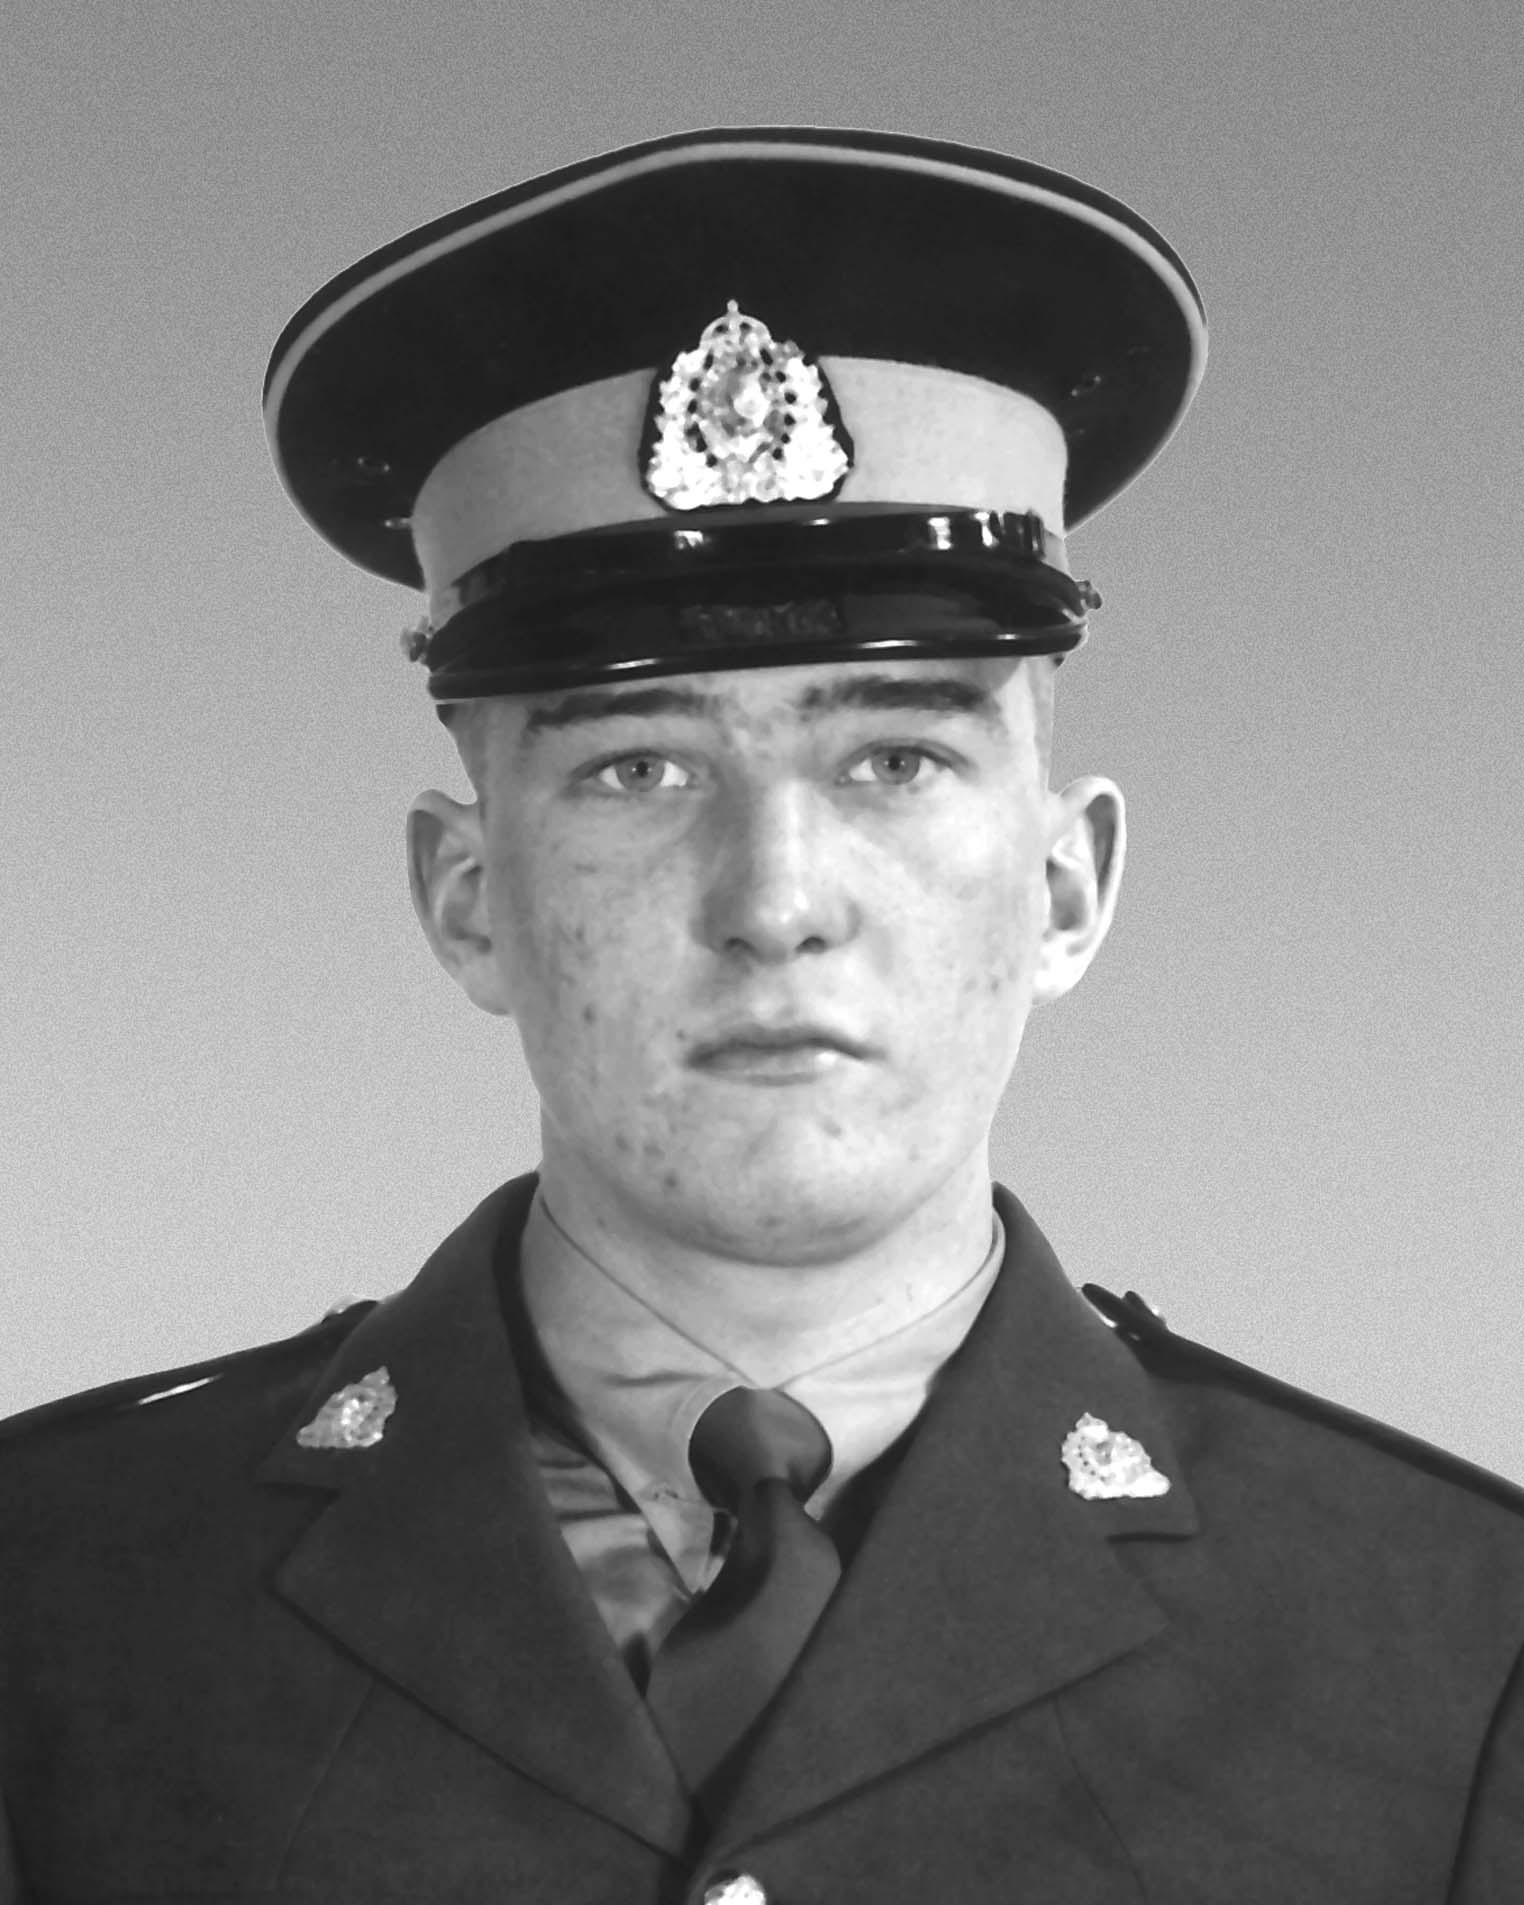 Constable John Roland Cobley